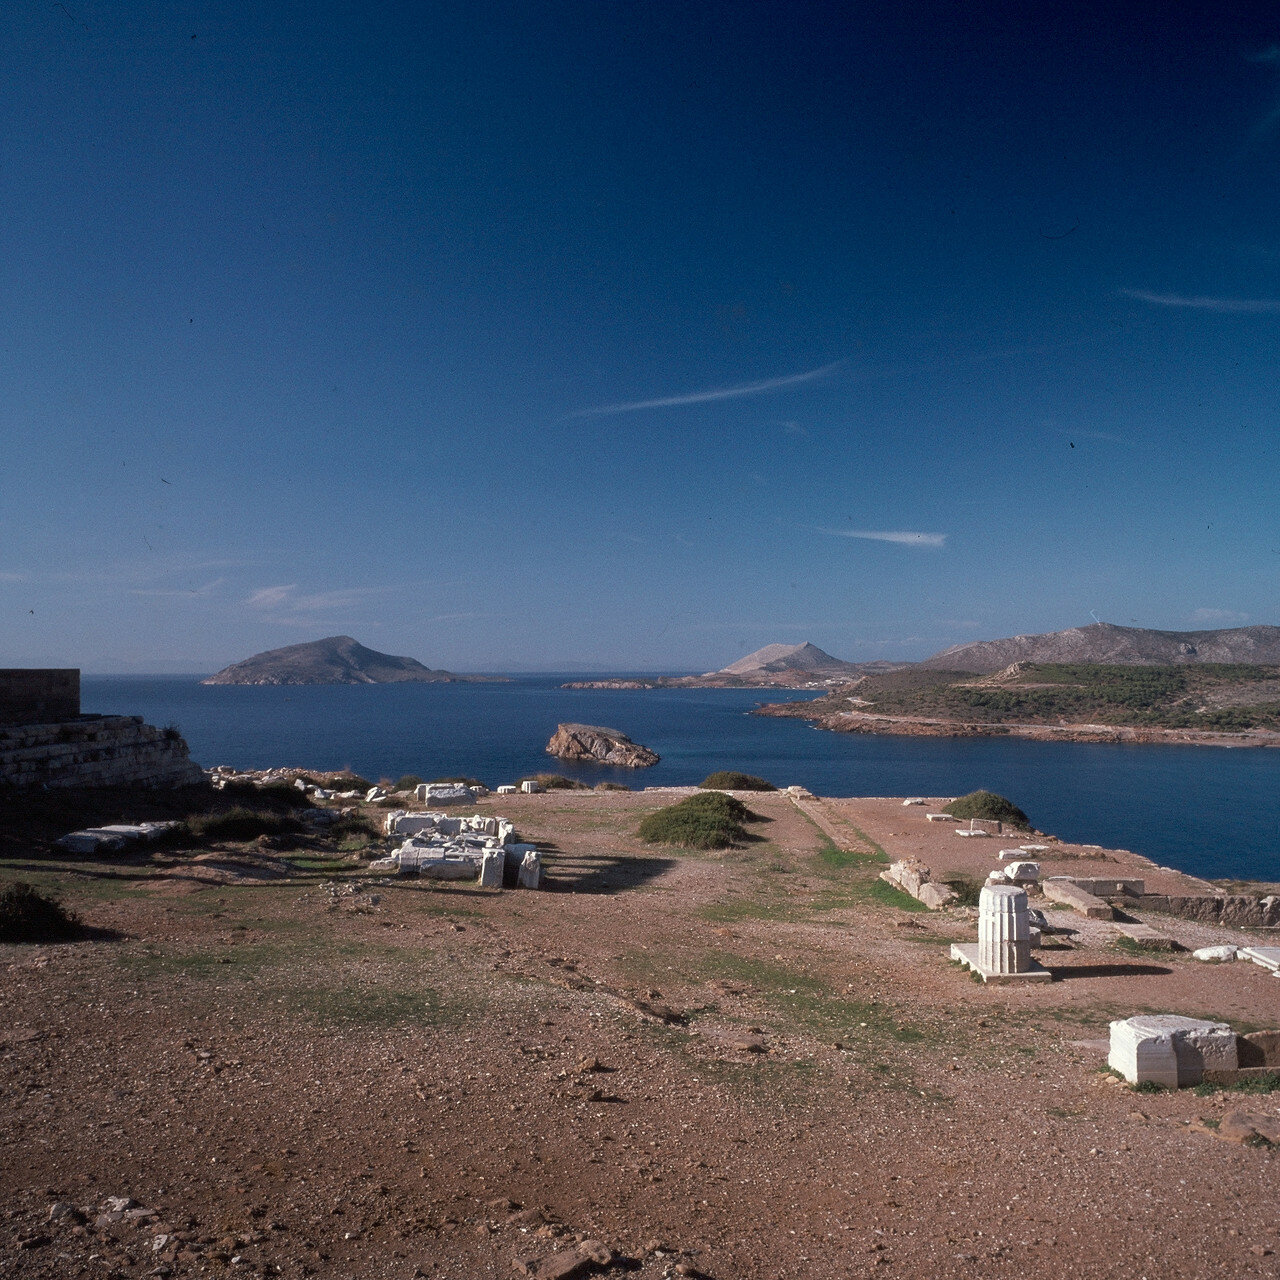 Храм Посейдона, Терраса сокровищницы под храмом Посейдона